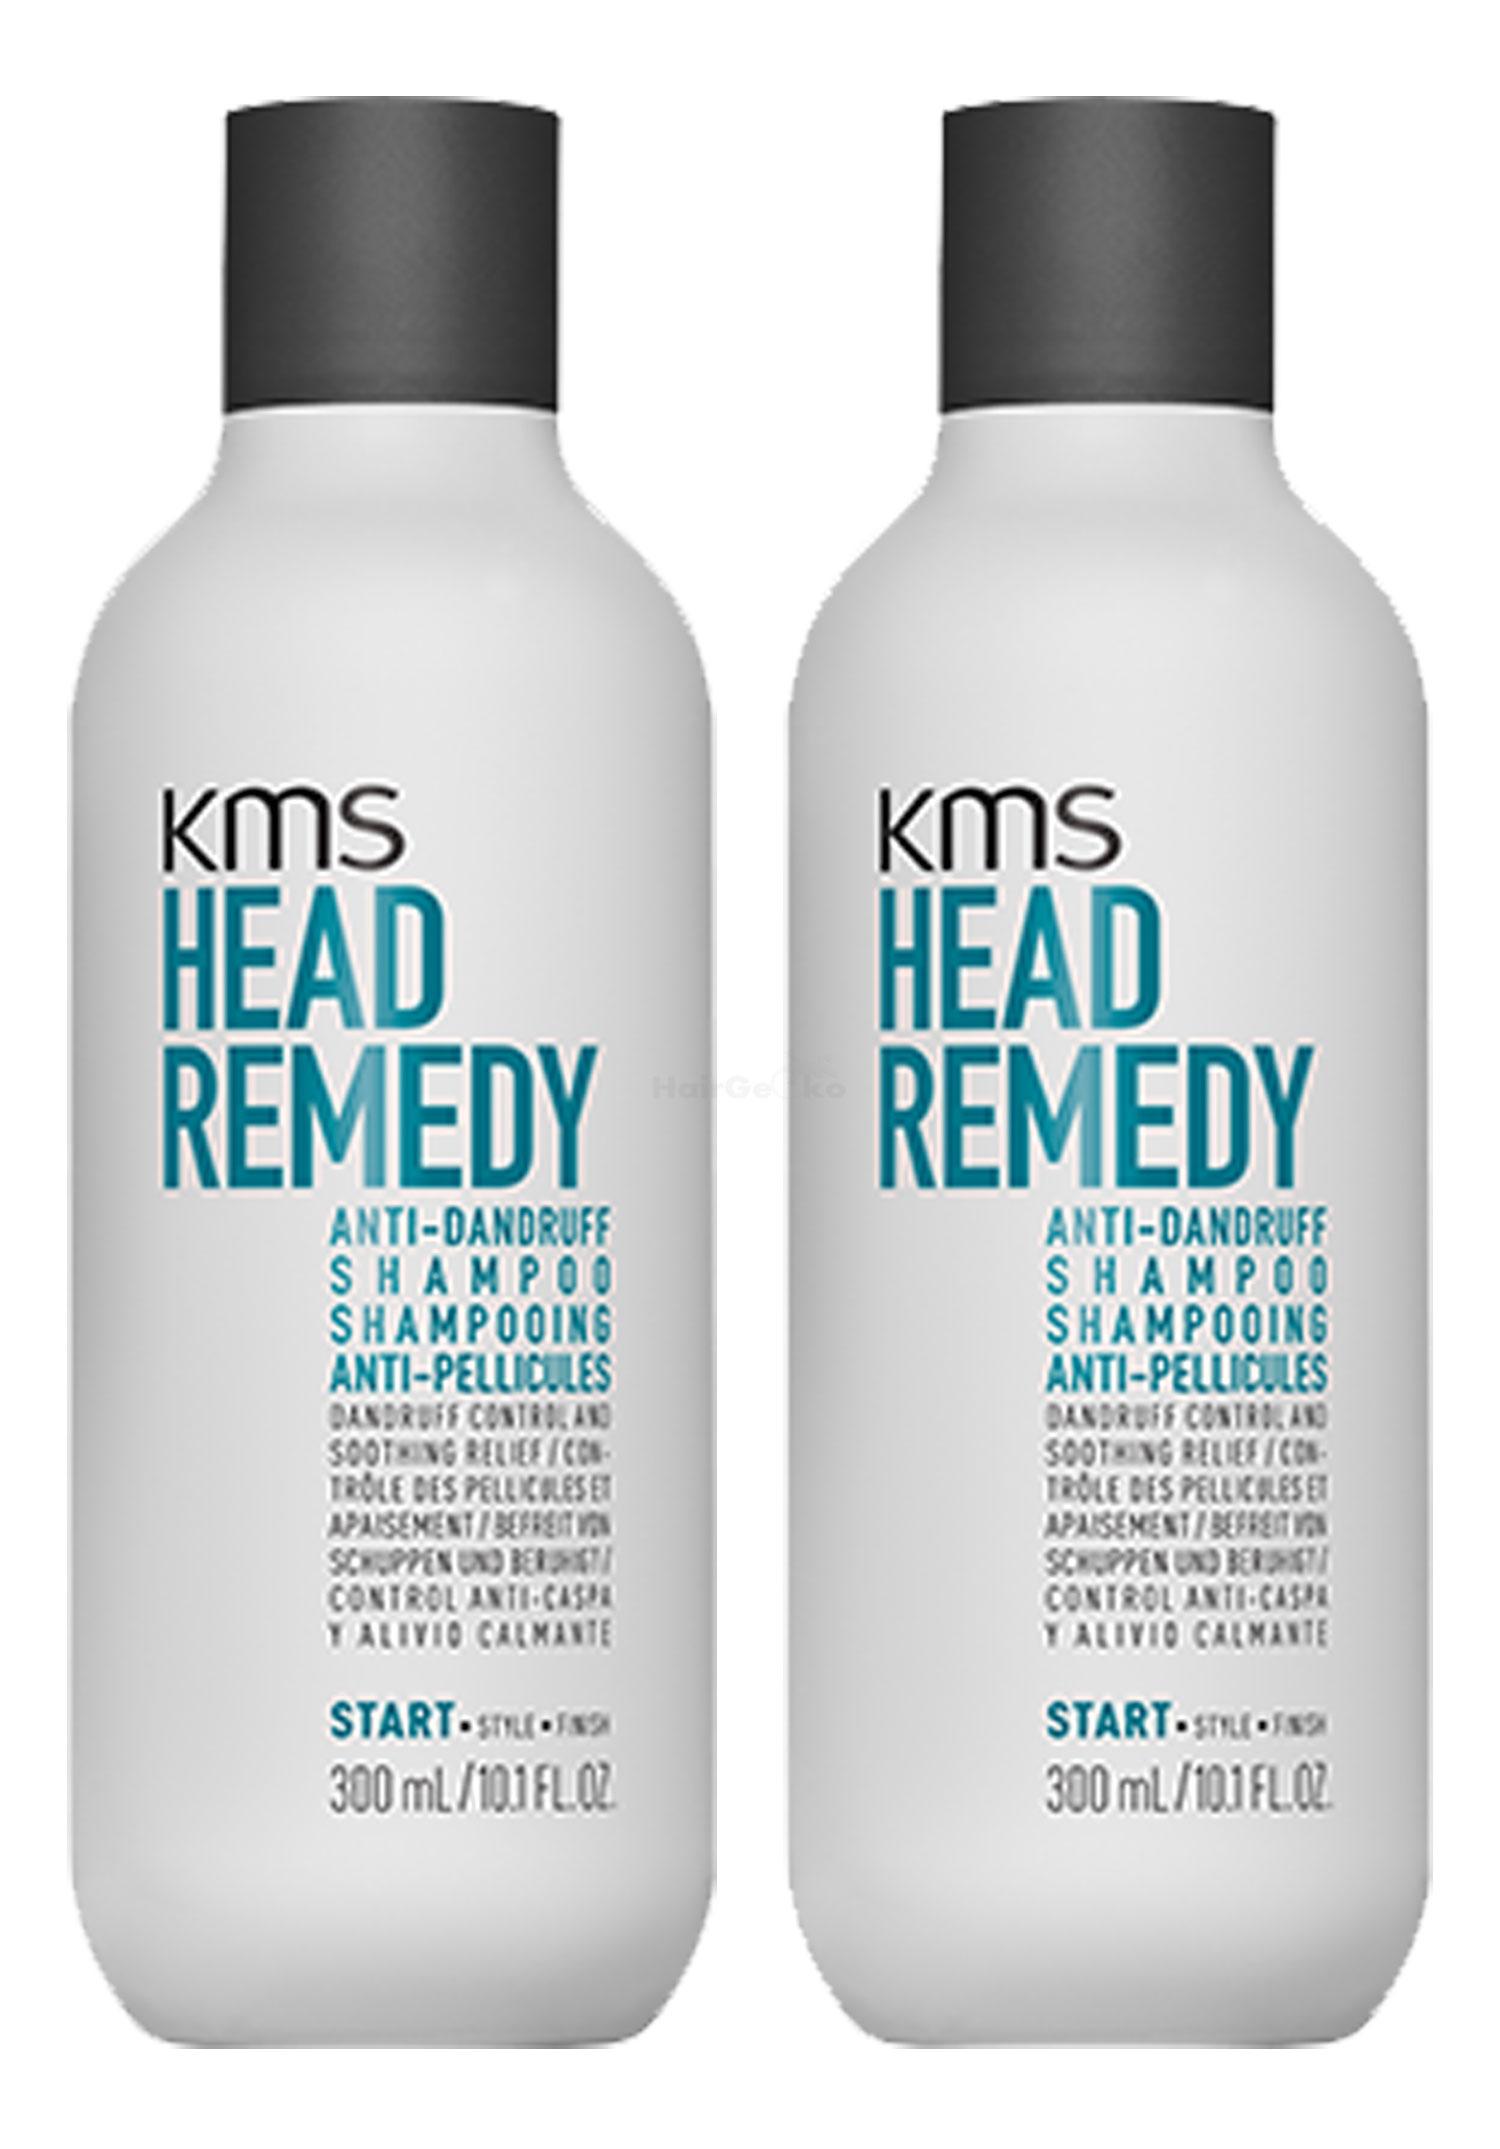 KMS California HEADREMEDY Anti-Dandruff Shampoo 300ml x2 = 600ml - NEU